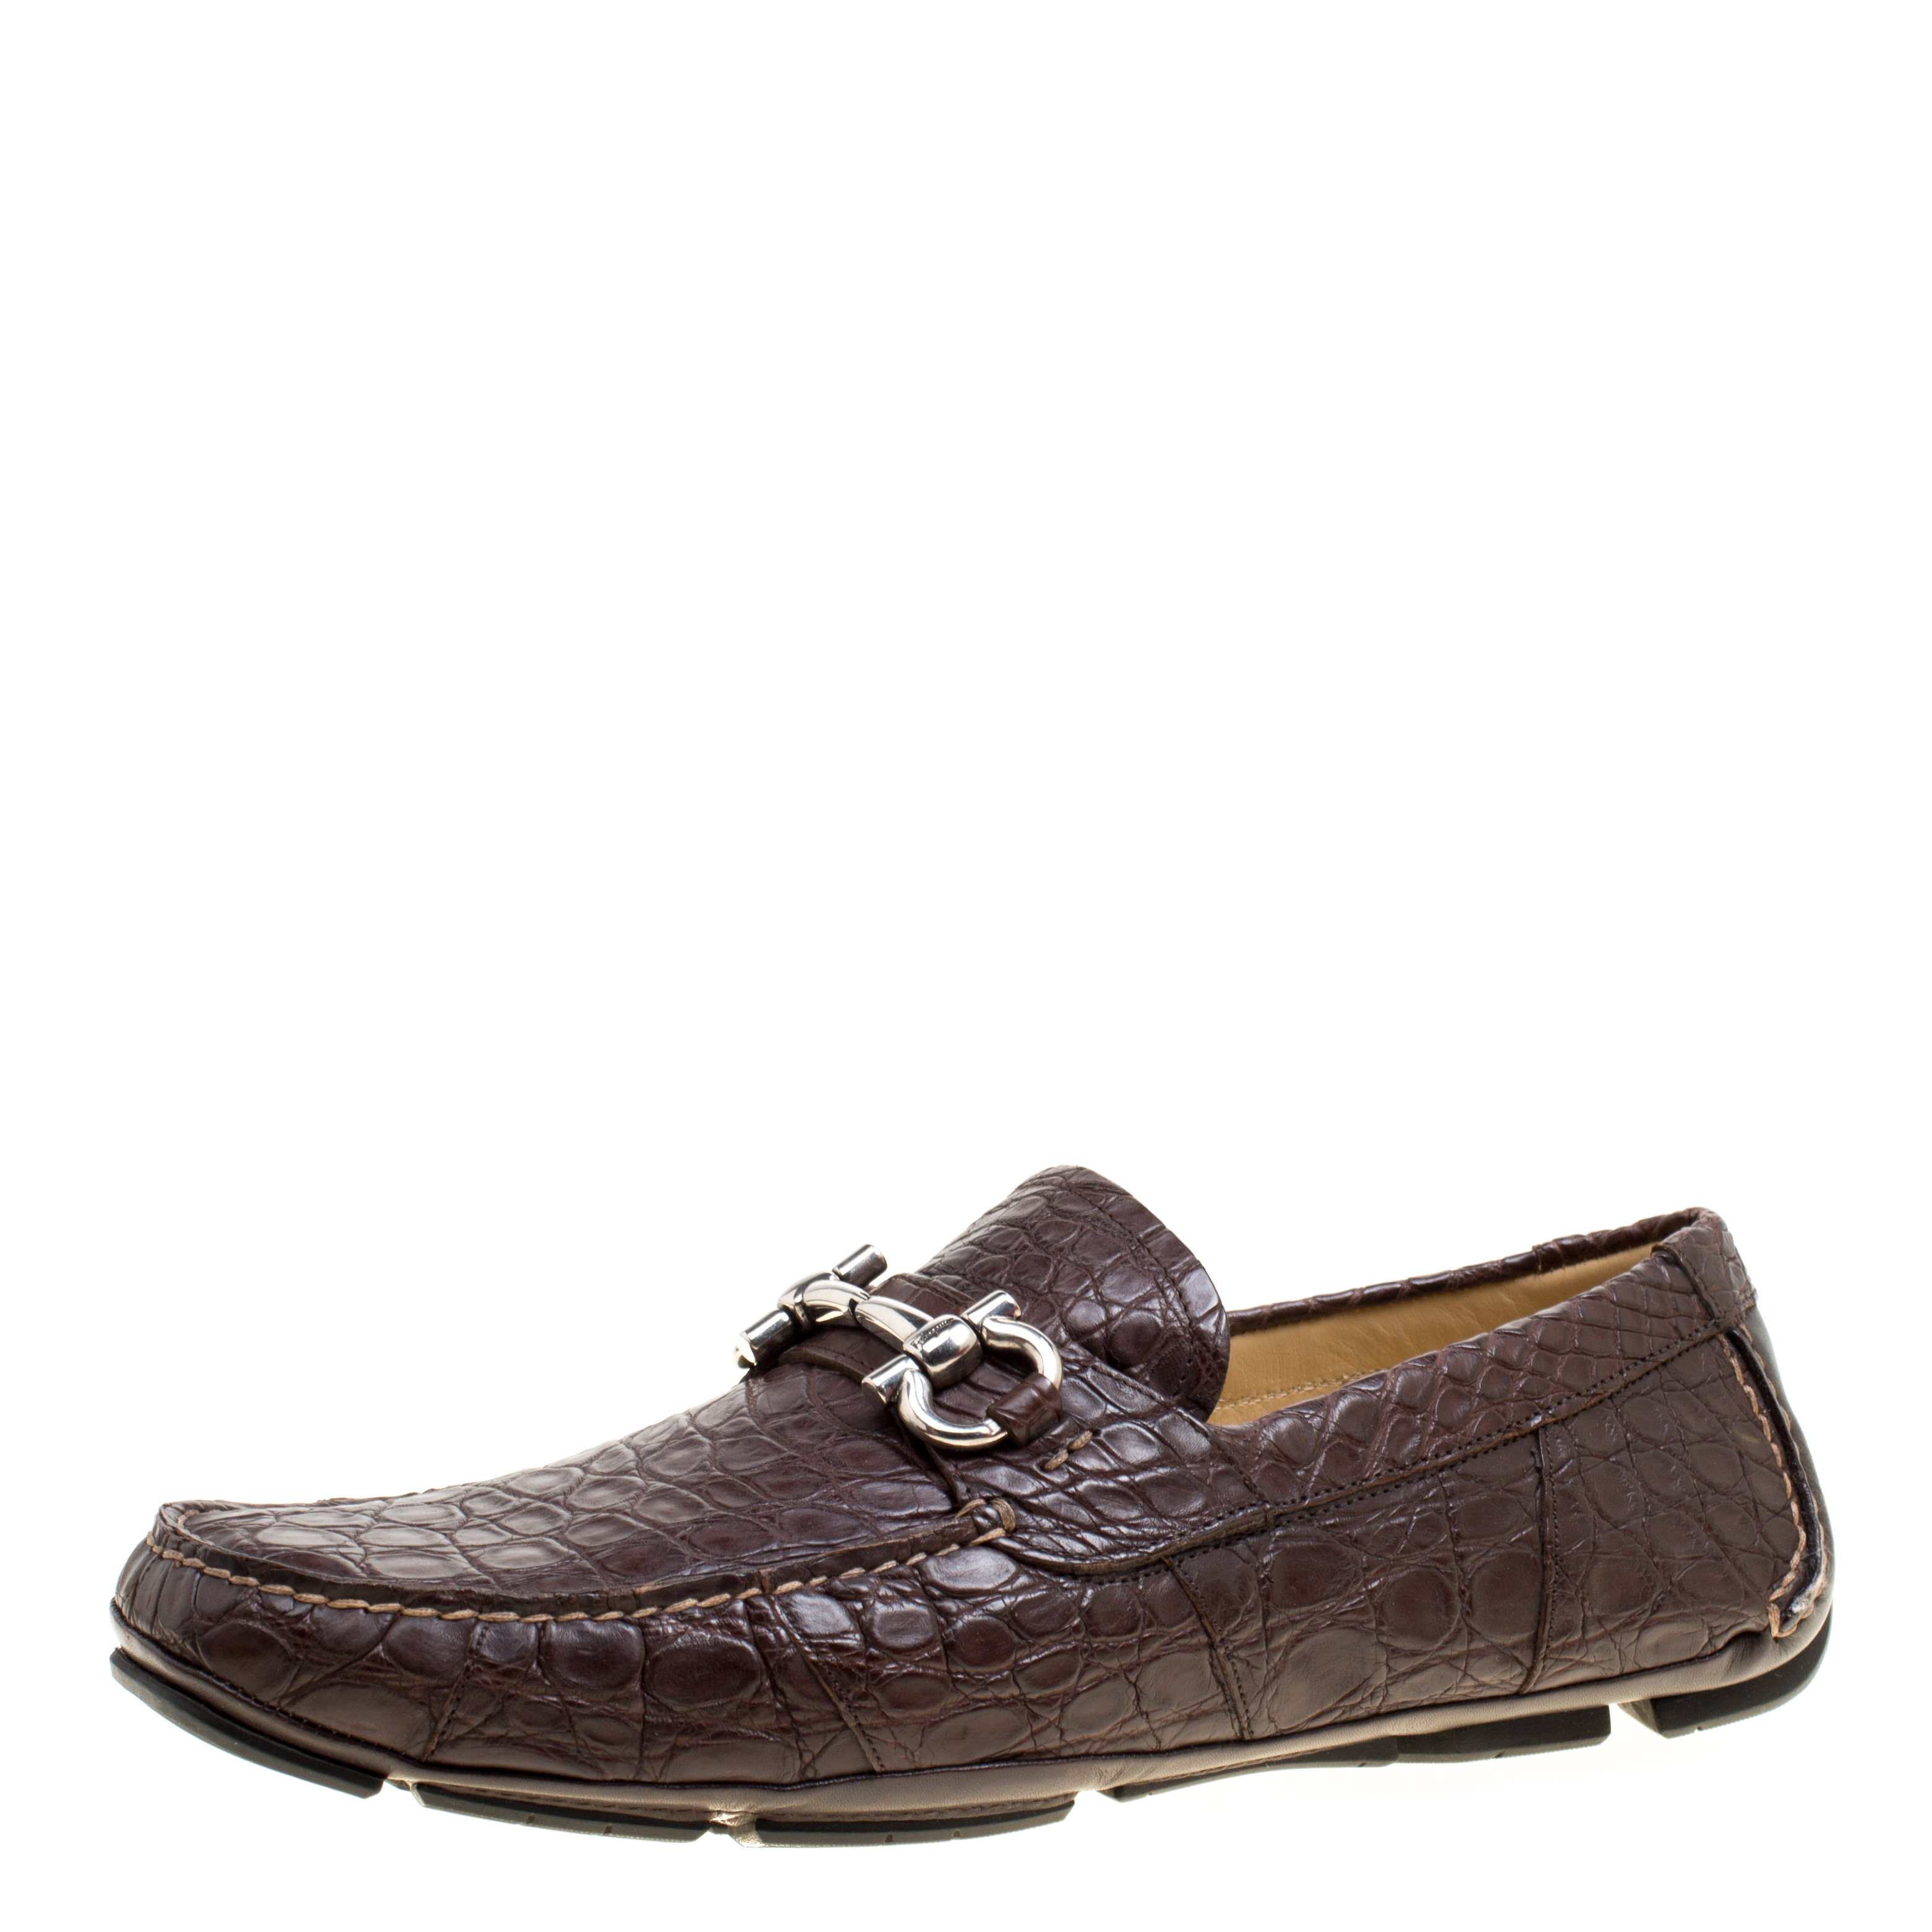 Salvatore Ferragamo Brown Crocodile Leather Parigi Bit Loafers Size 45